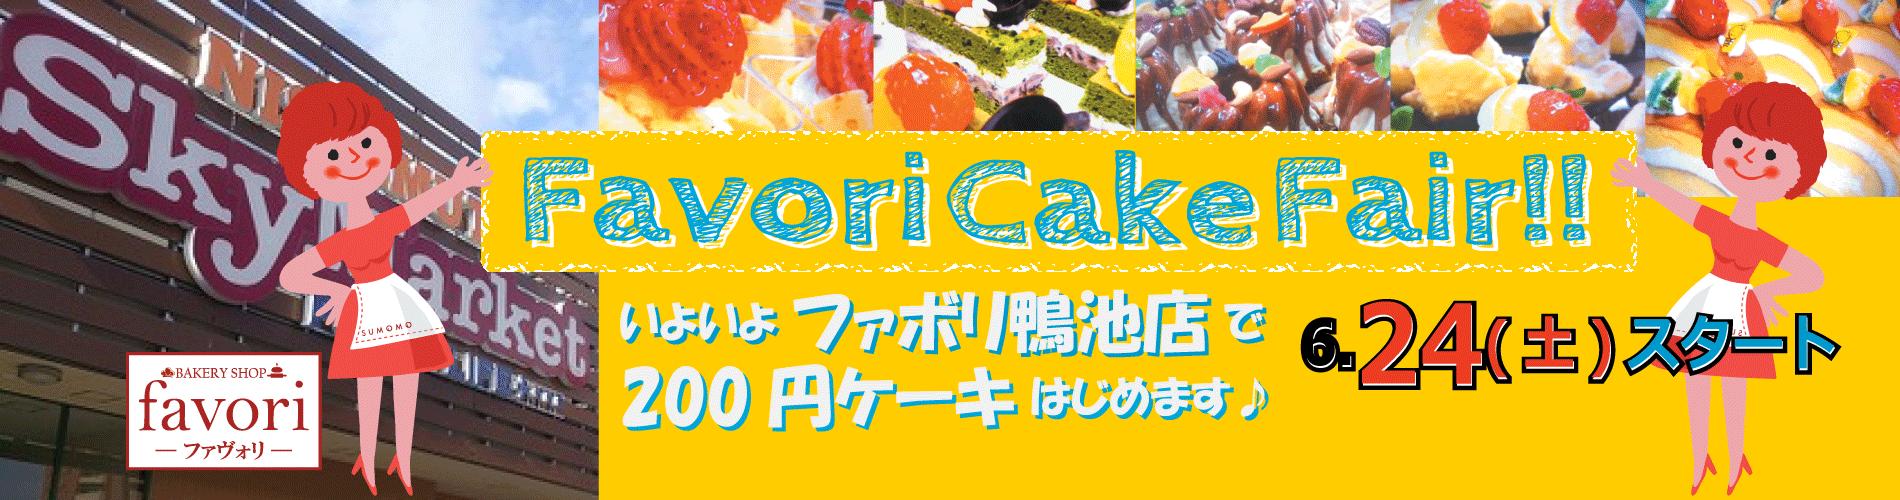 favori 鴨池店 200円ケーキ販売開始